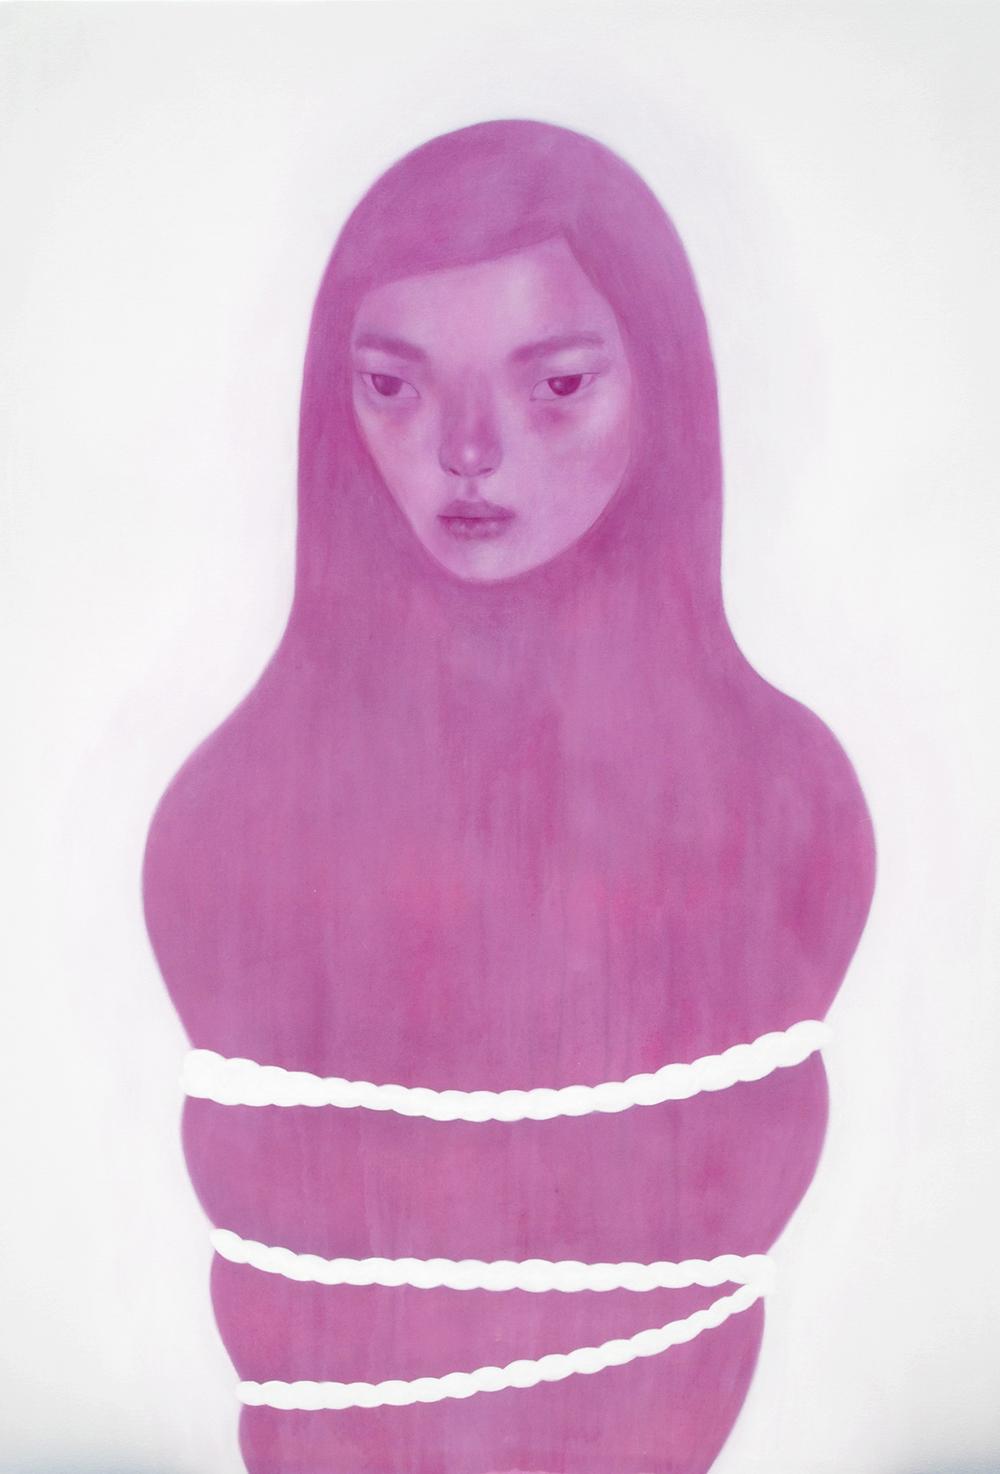 Artwork by Tae Lee, courtesy of BLUEorange Gallery